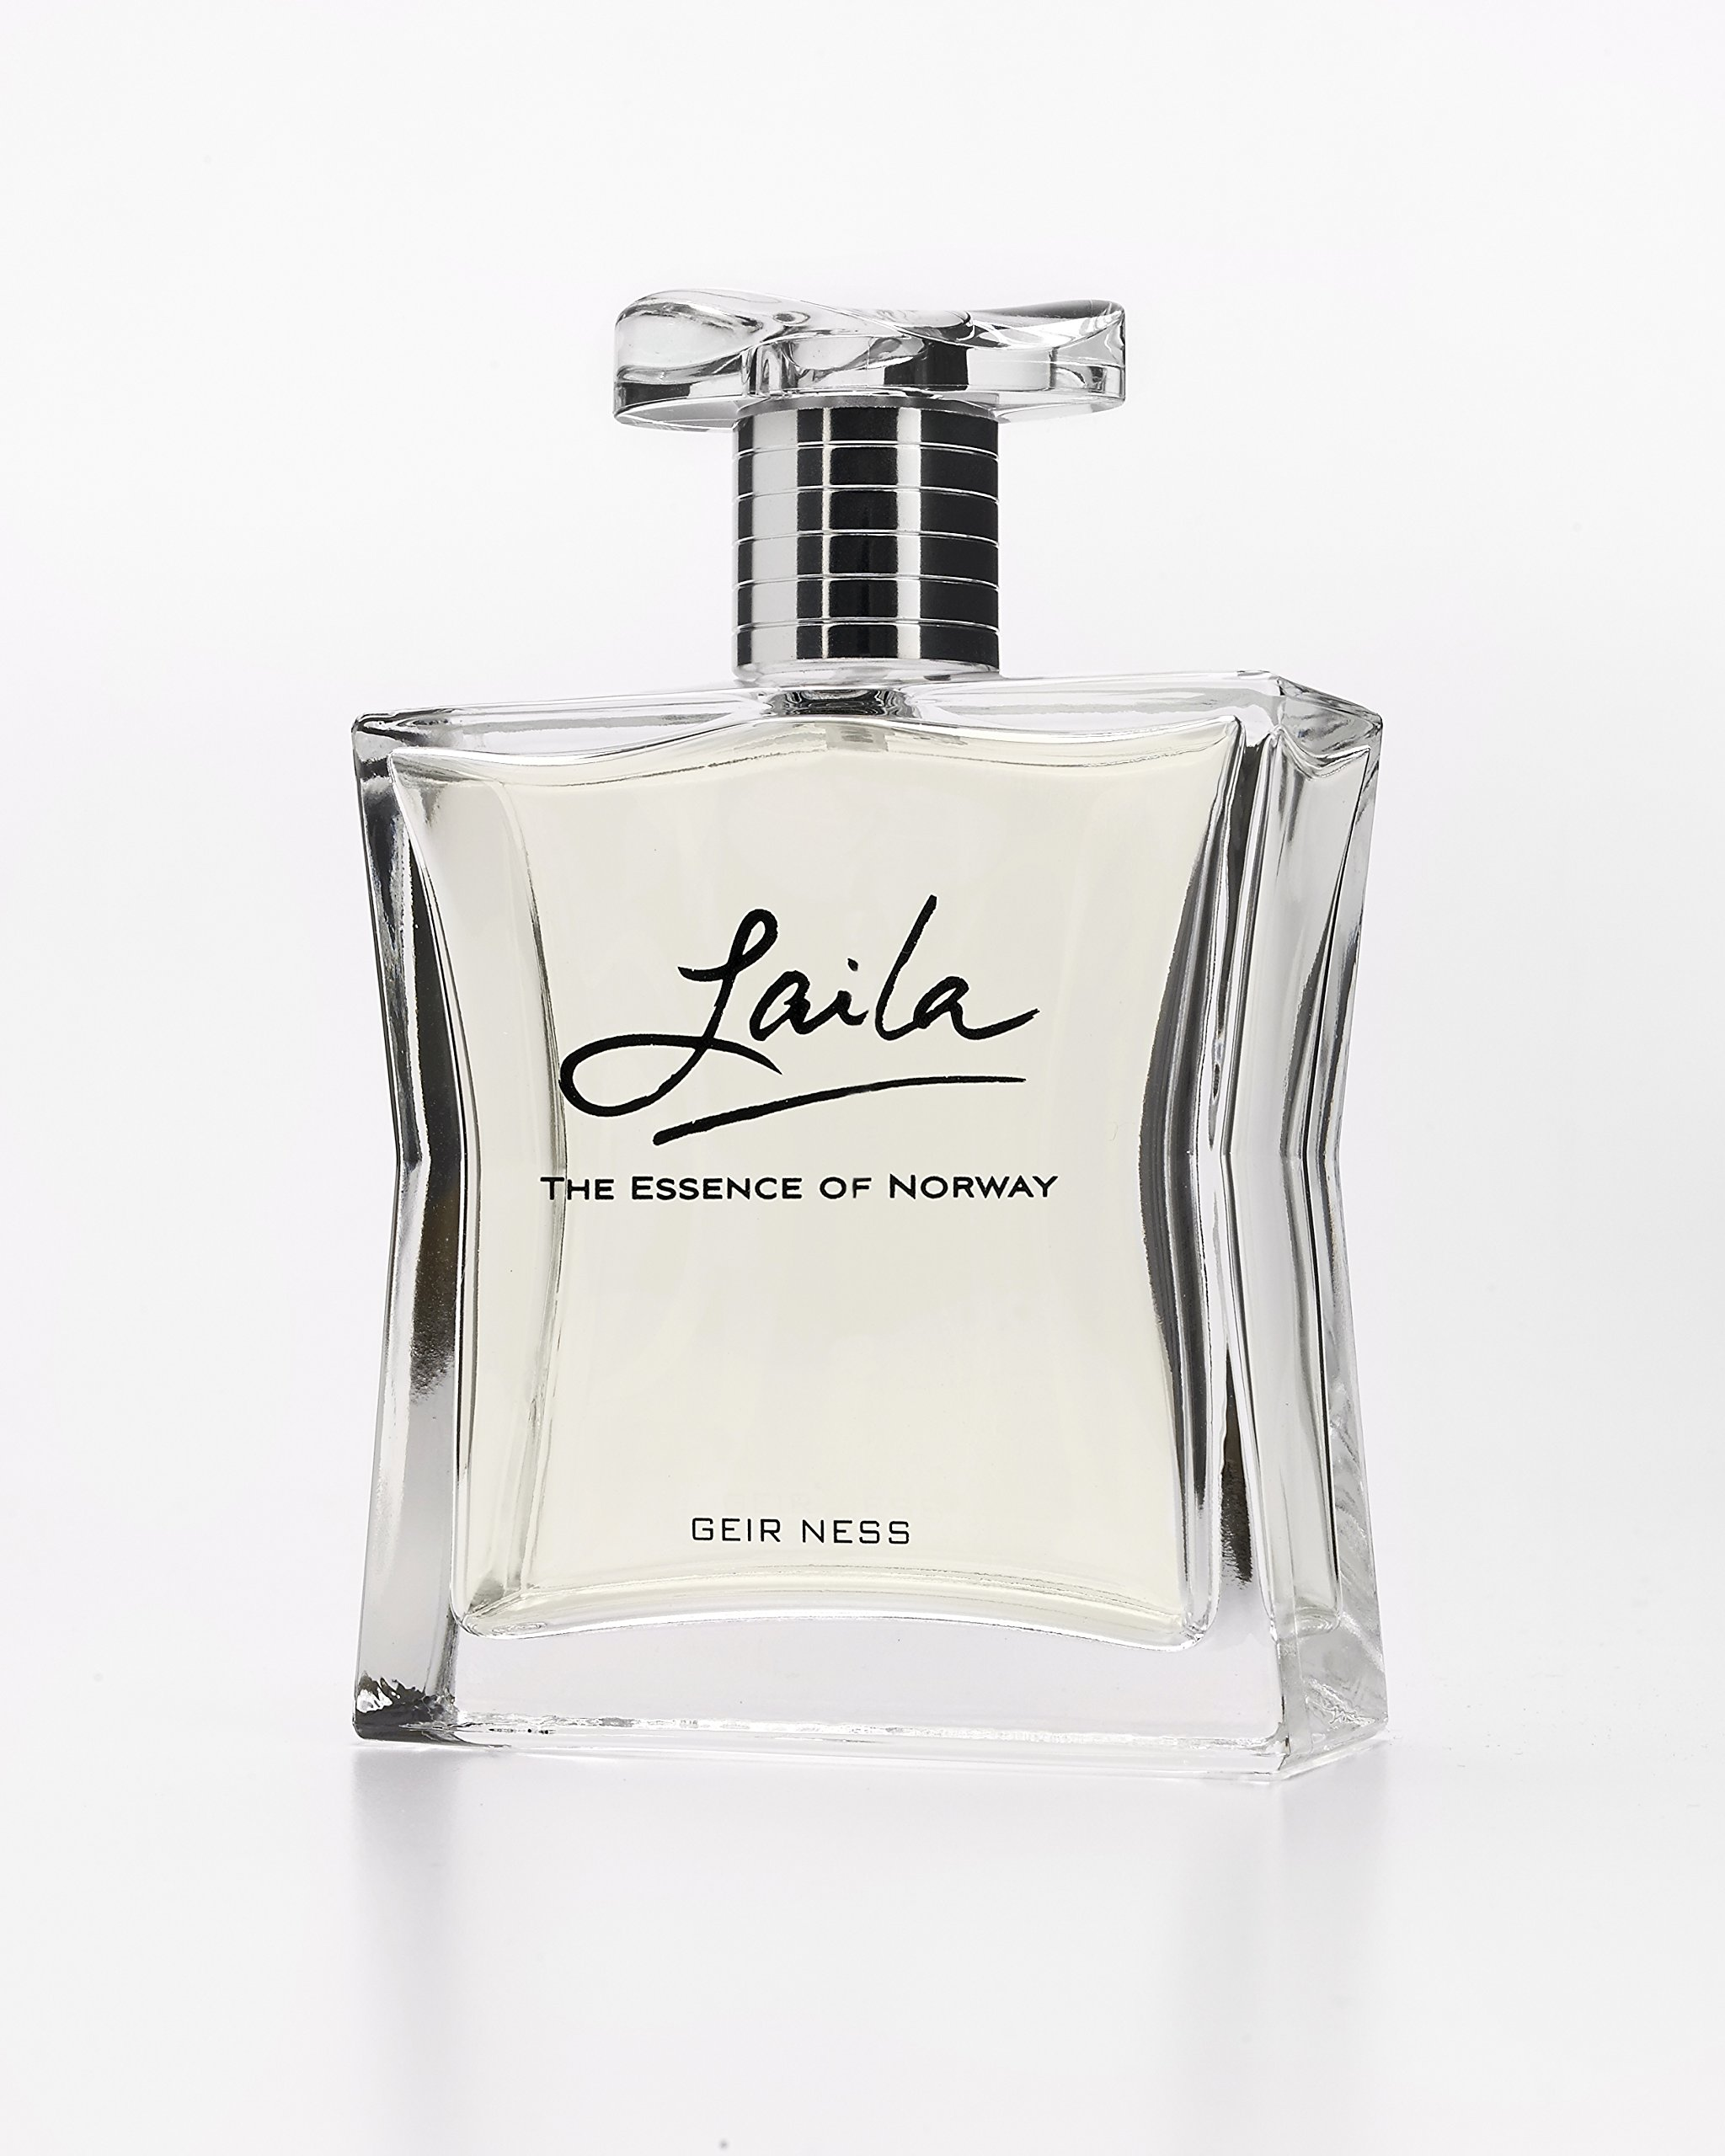 Laila By Geir Ness For Women, Eau De Parfum Spray, 3.4-Ounce Bottle by Geir Ness